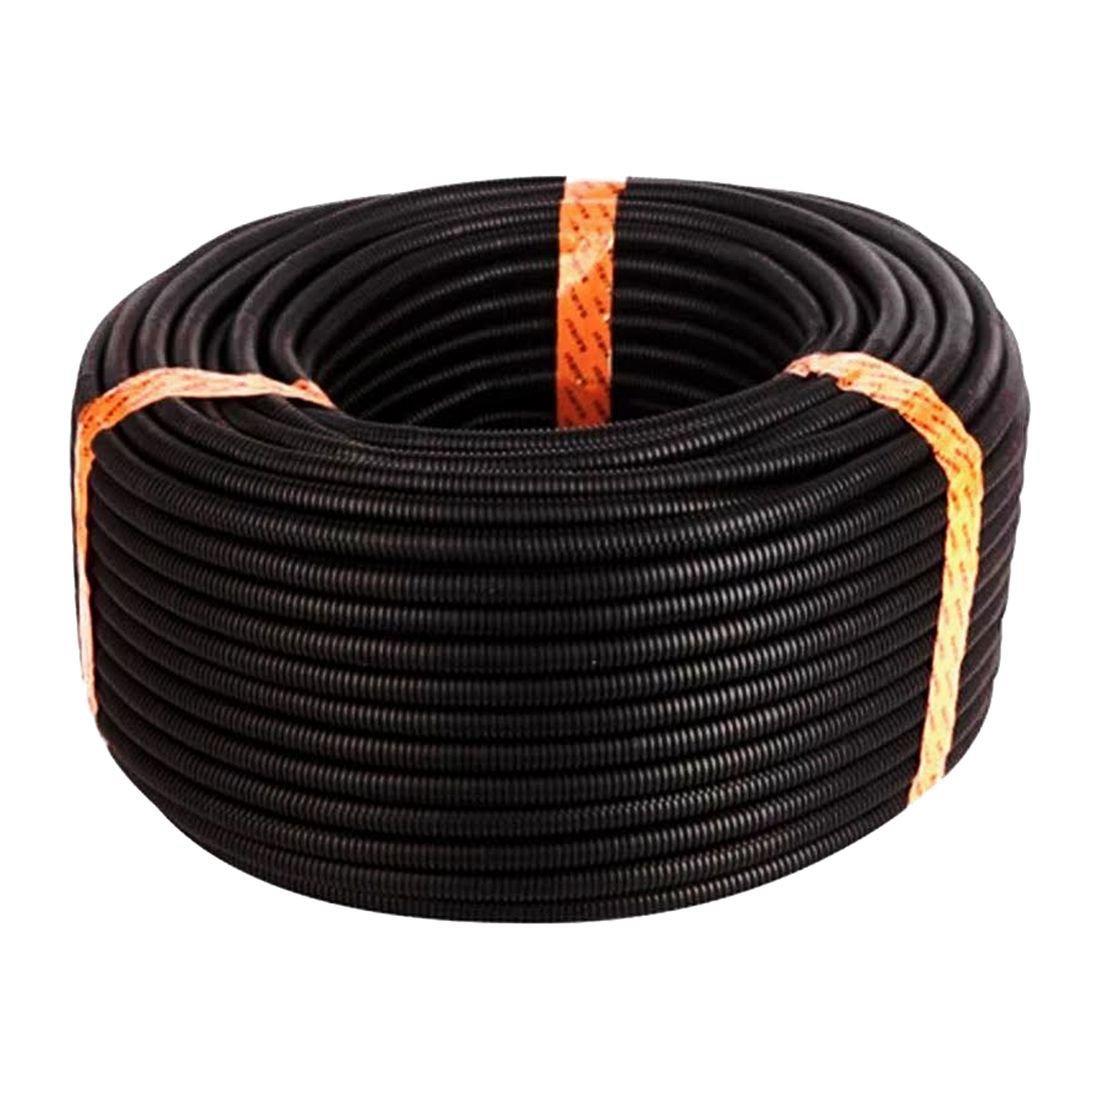 SODIAL 100 Ft 3/8 inch Split Wire Loom Conduit Polyethylene Tubing Black Color Sleeve Tube